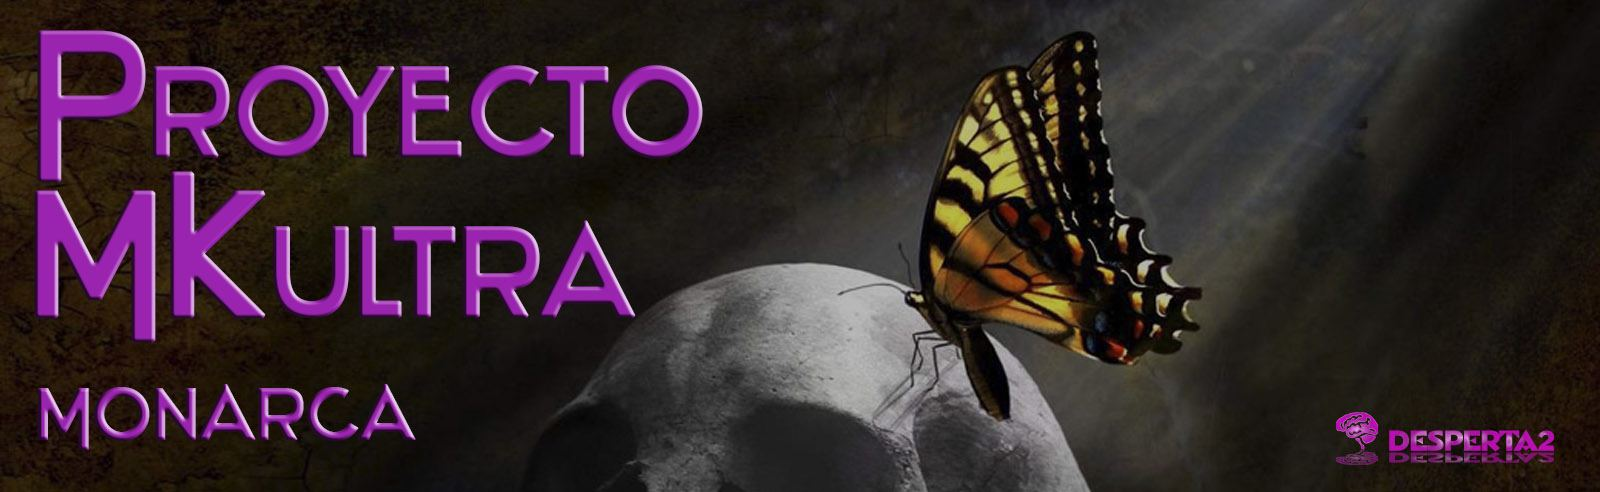 proyecto-mkultra-monarca